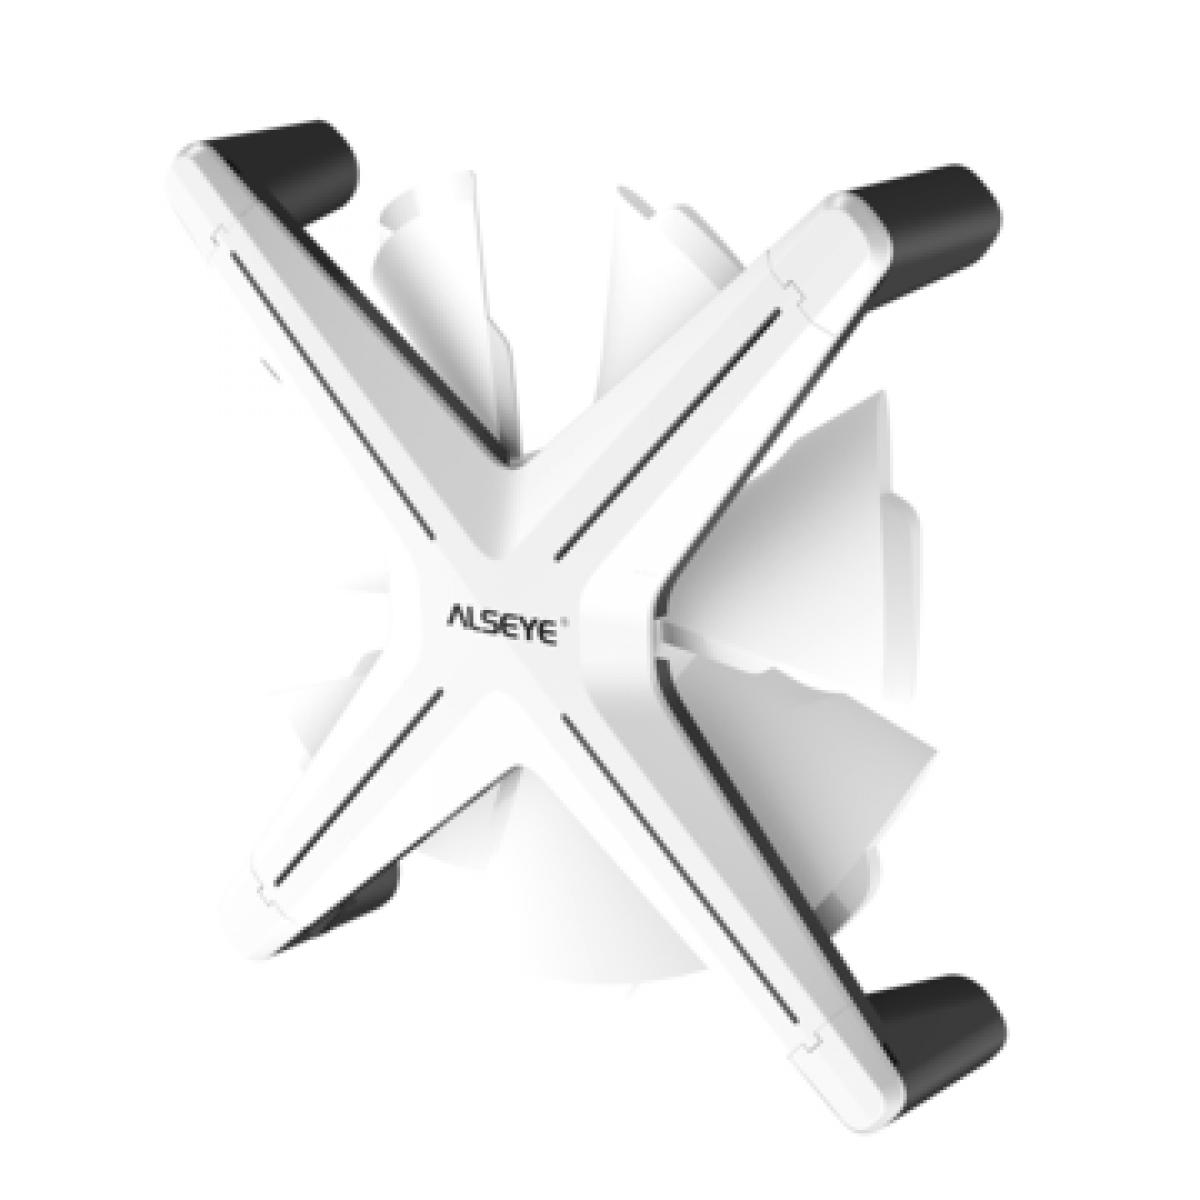 Cooler para Gabinete Alseye X12, ARGB, White, 120mm